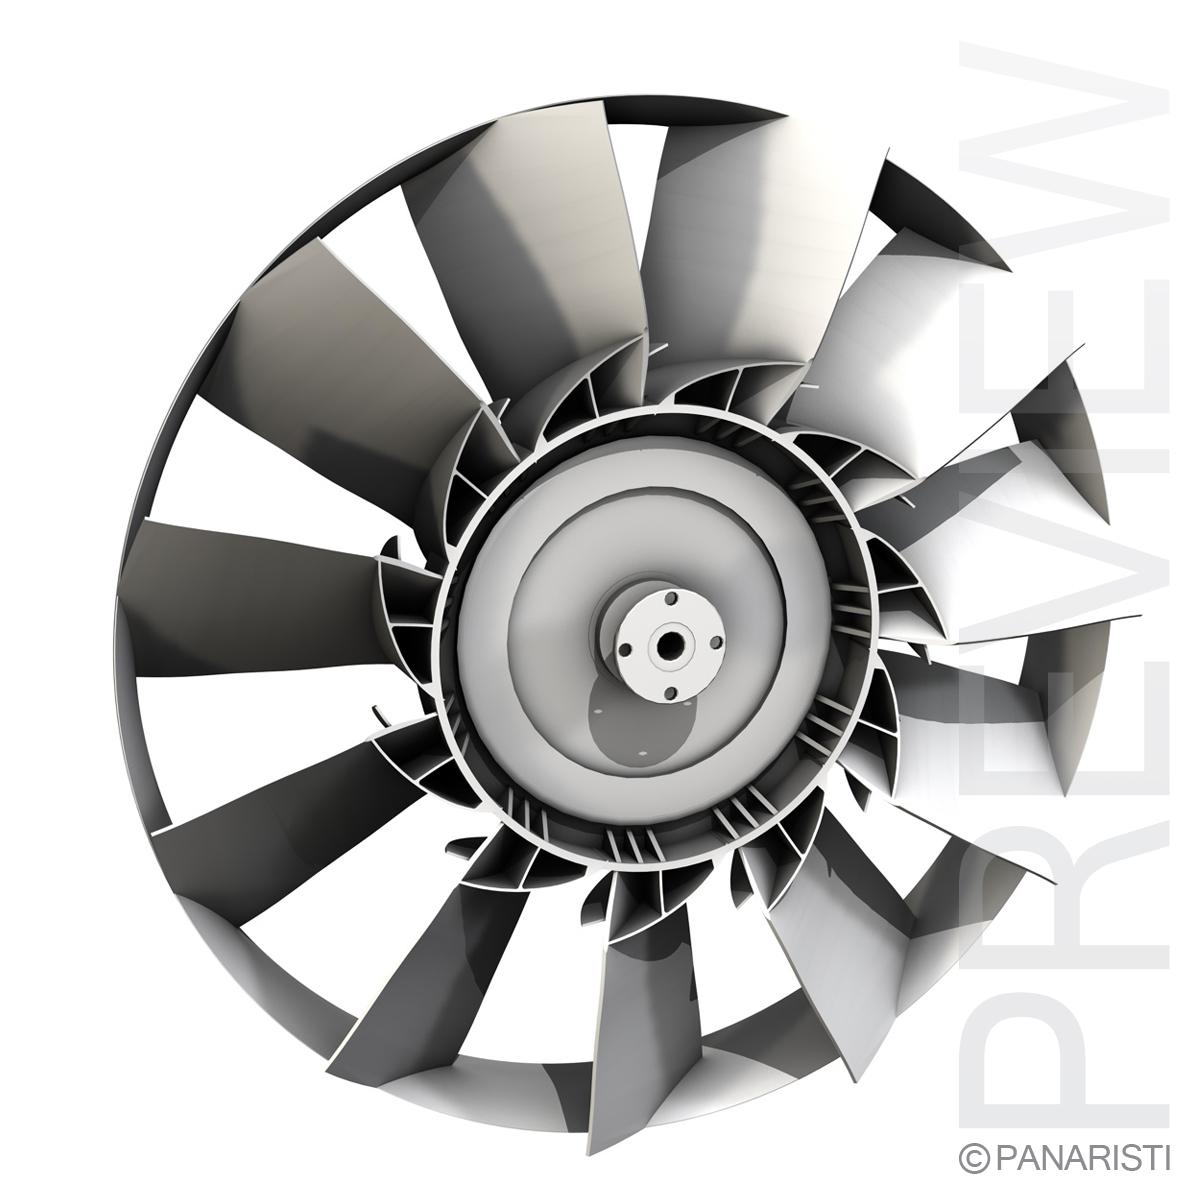 Engine cooling fan 2 3d model 3ds c4d lwo lws lw obj 129282